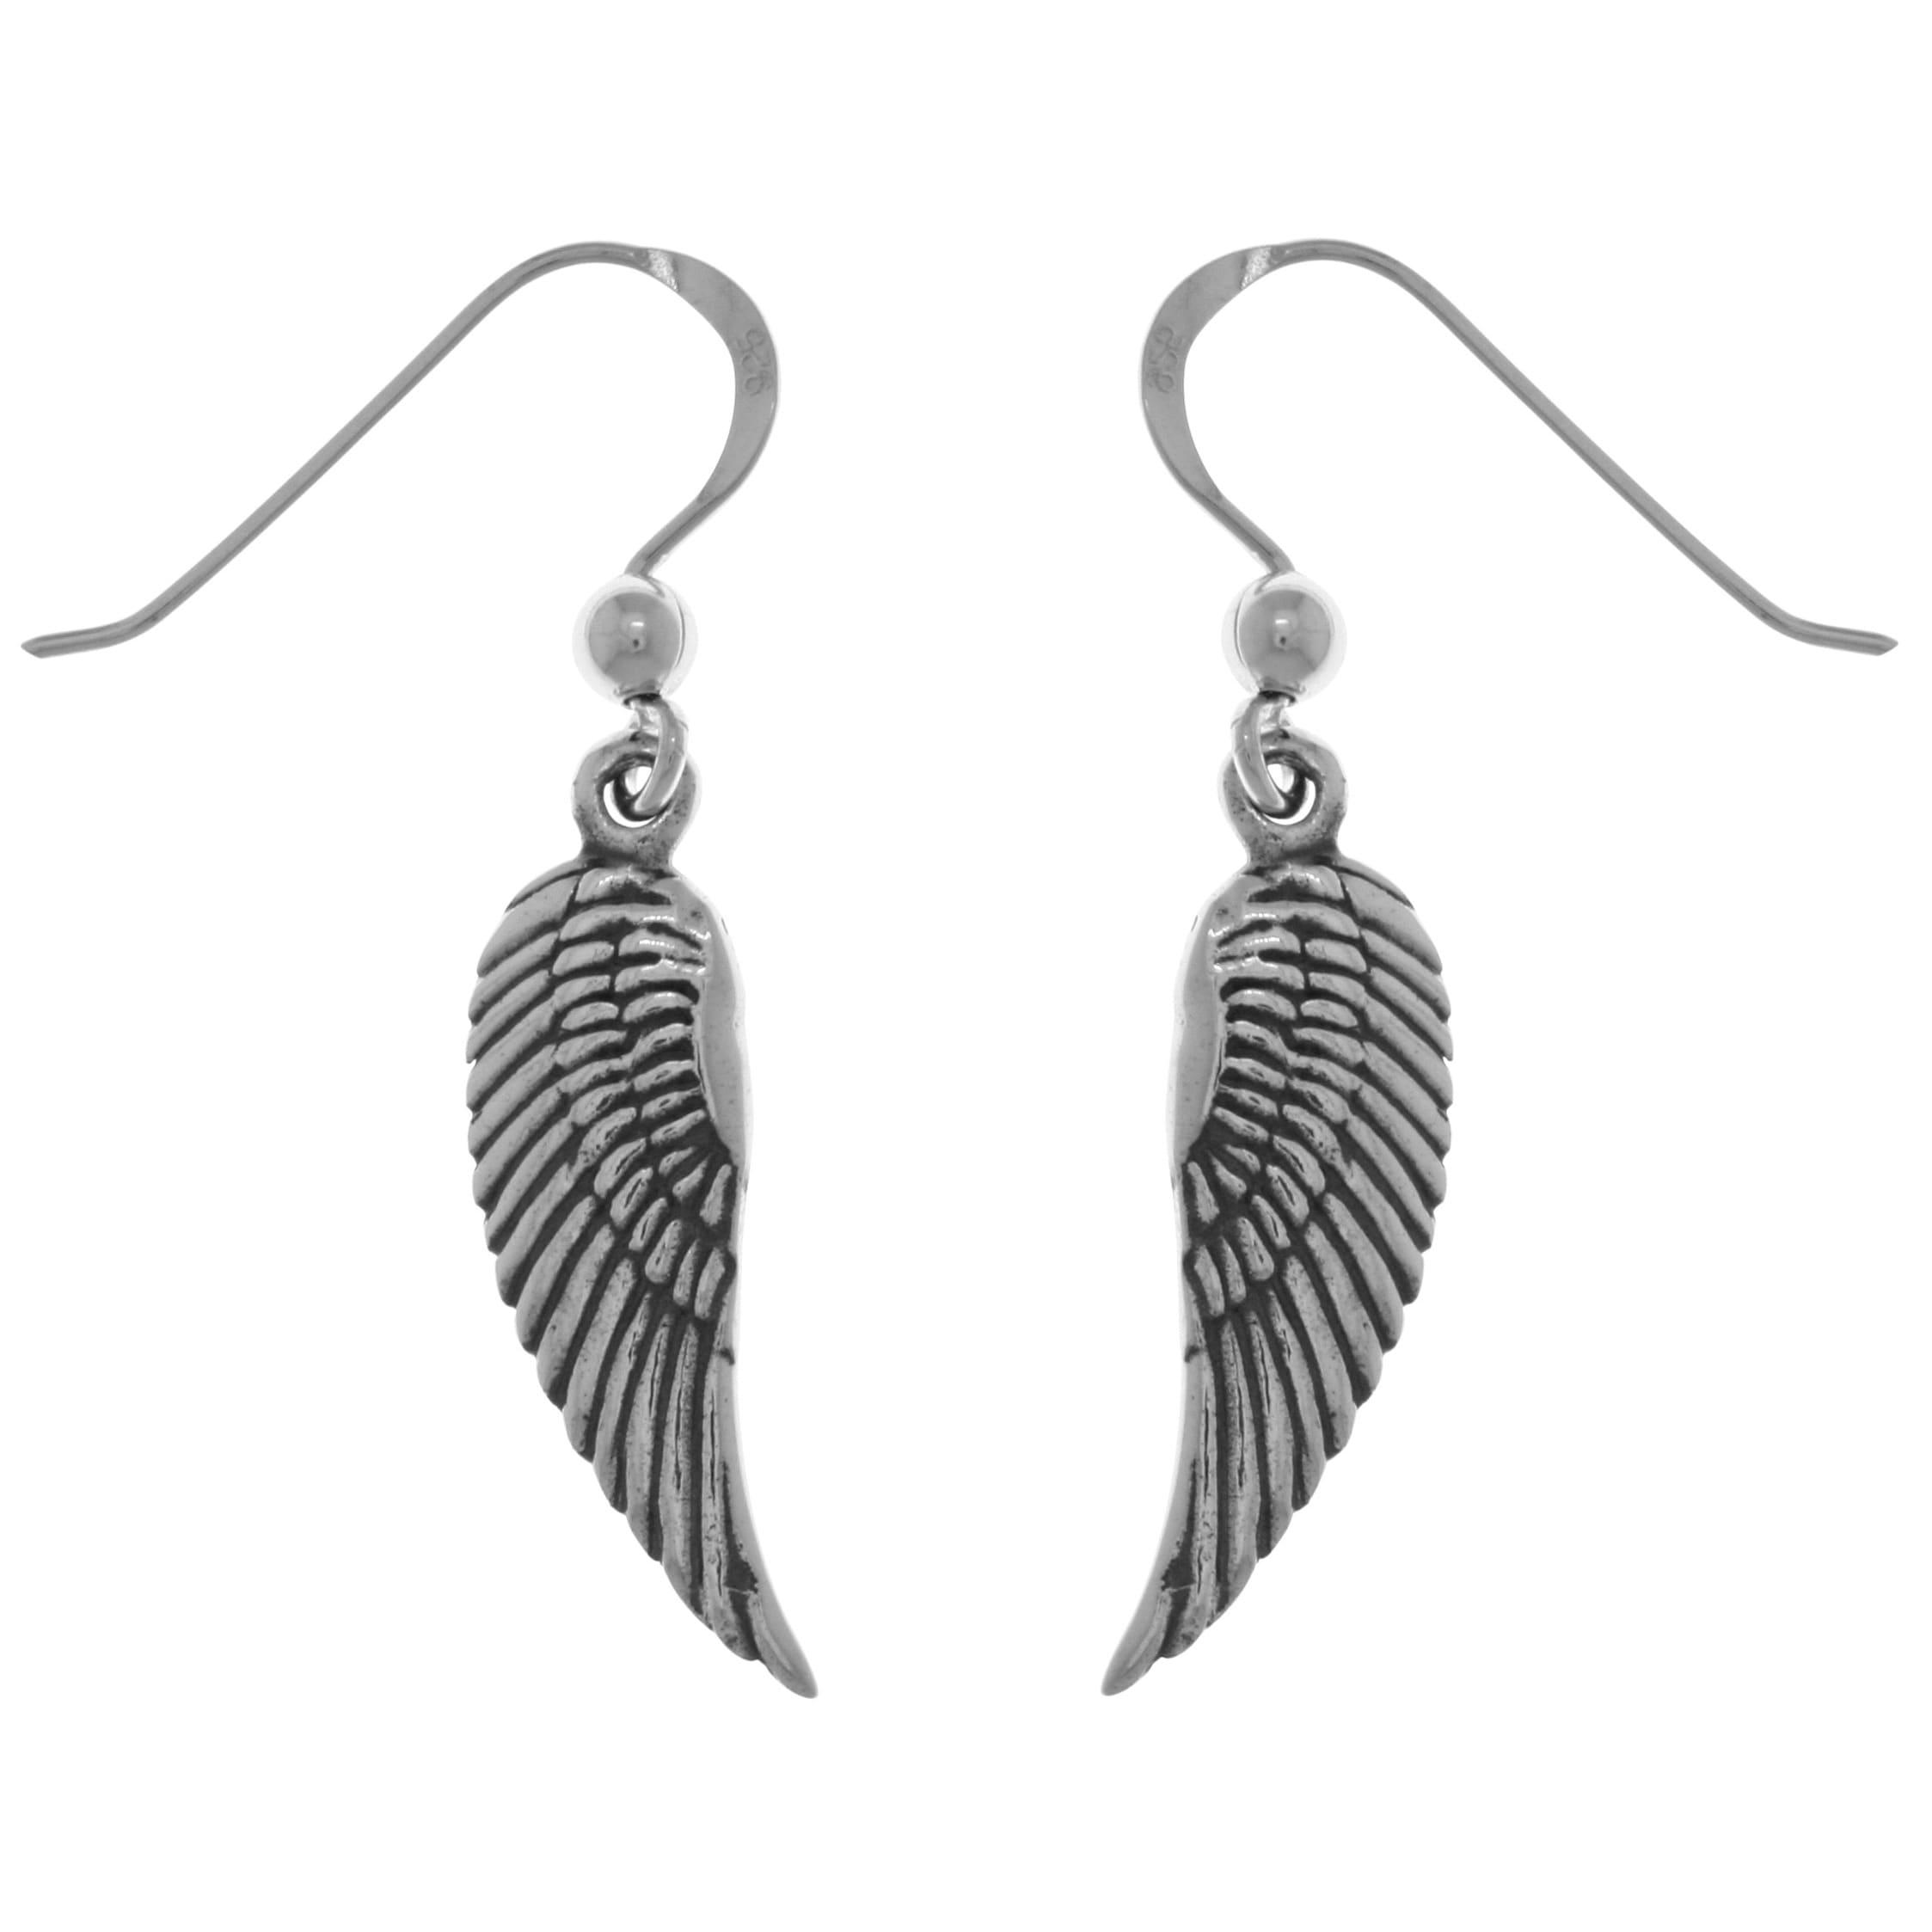 Angel?s glamourous pearl earrings advise dress for winter in 2019